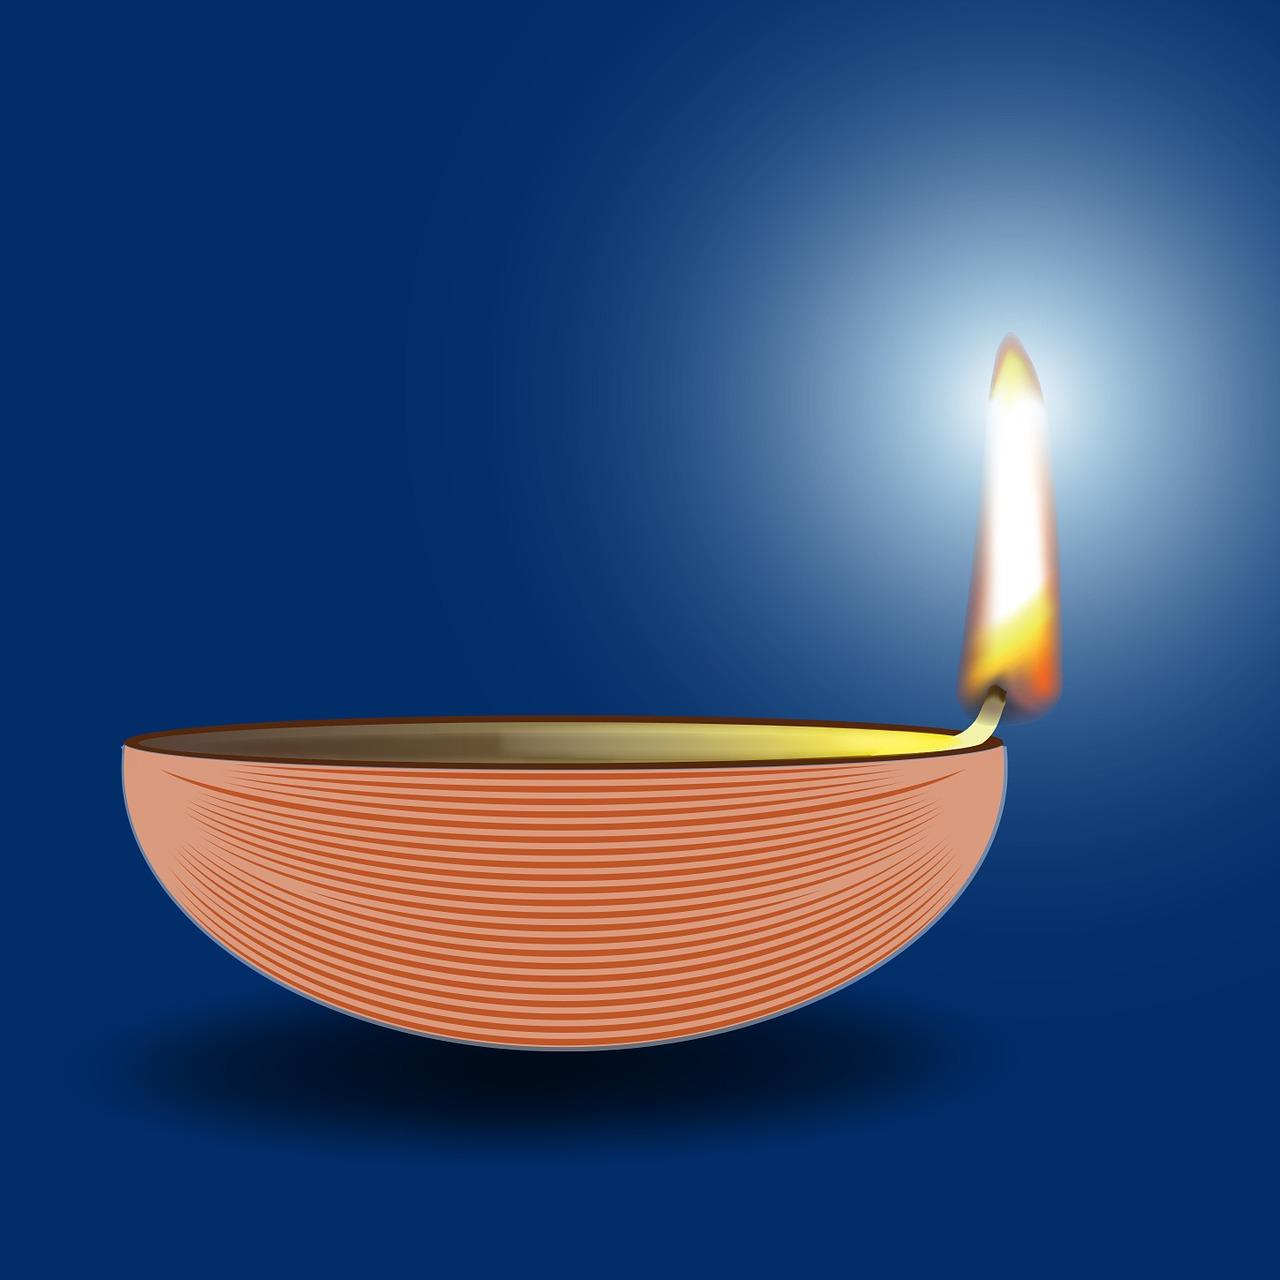 Candle Diwali Diya Free Image On Pixabay